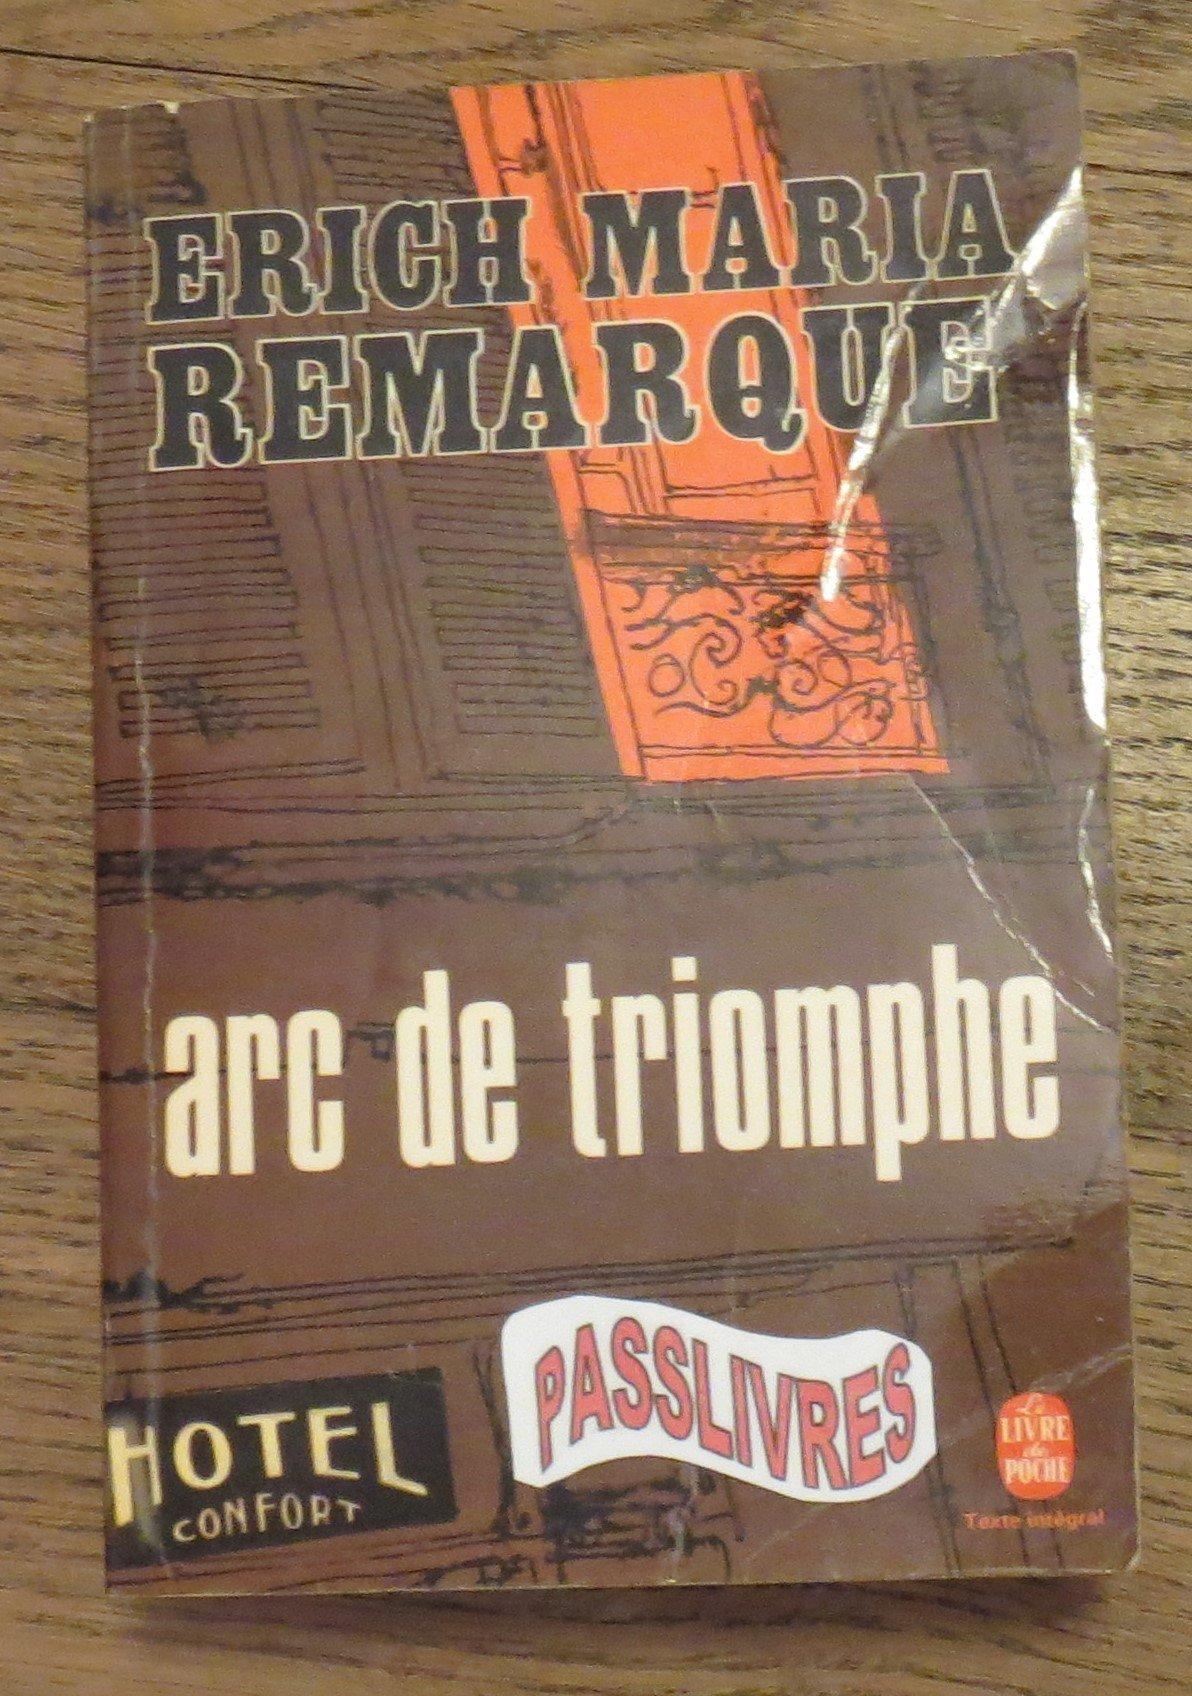 Erich Maria Remarque, Arc de Triomphe: a summary 94